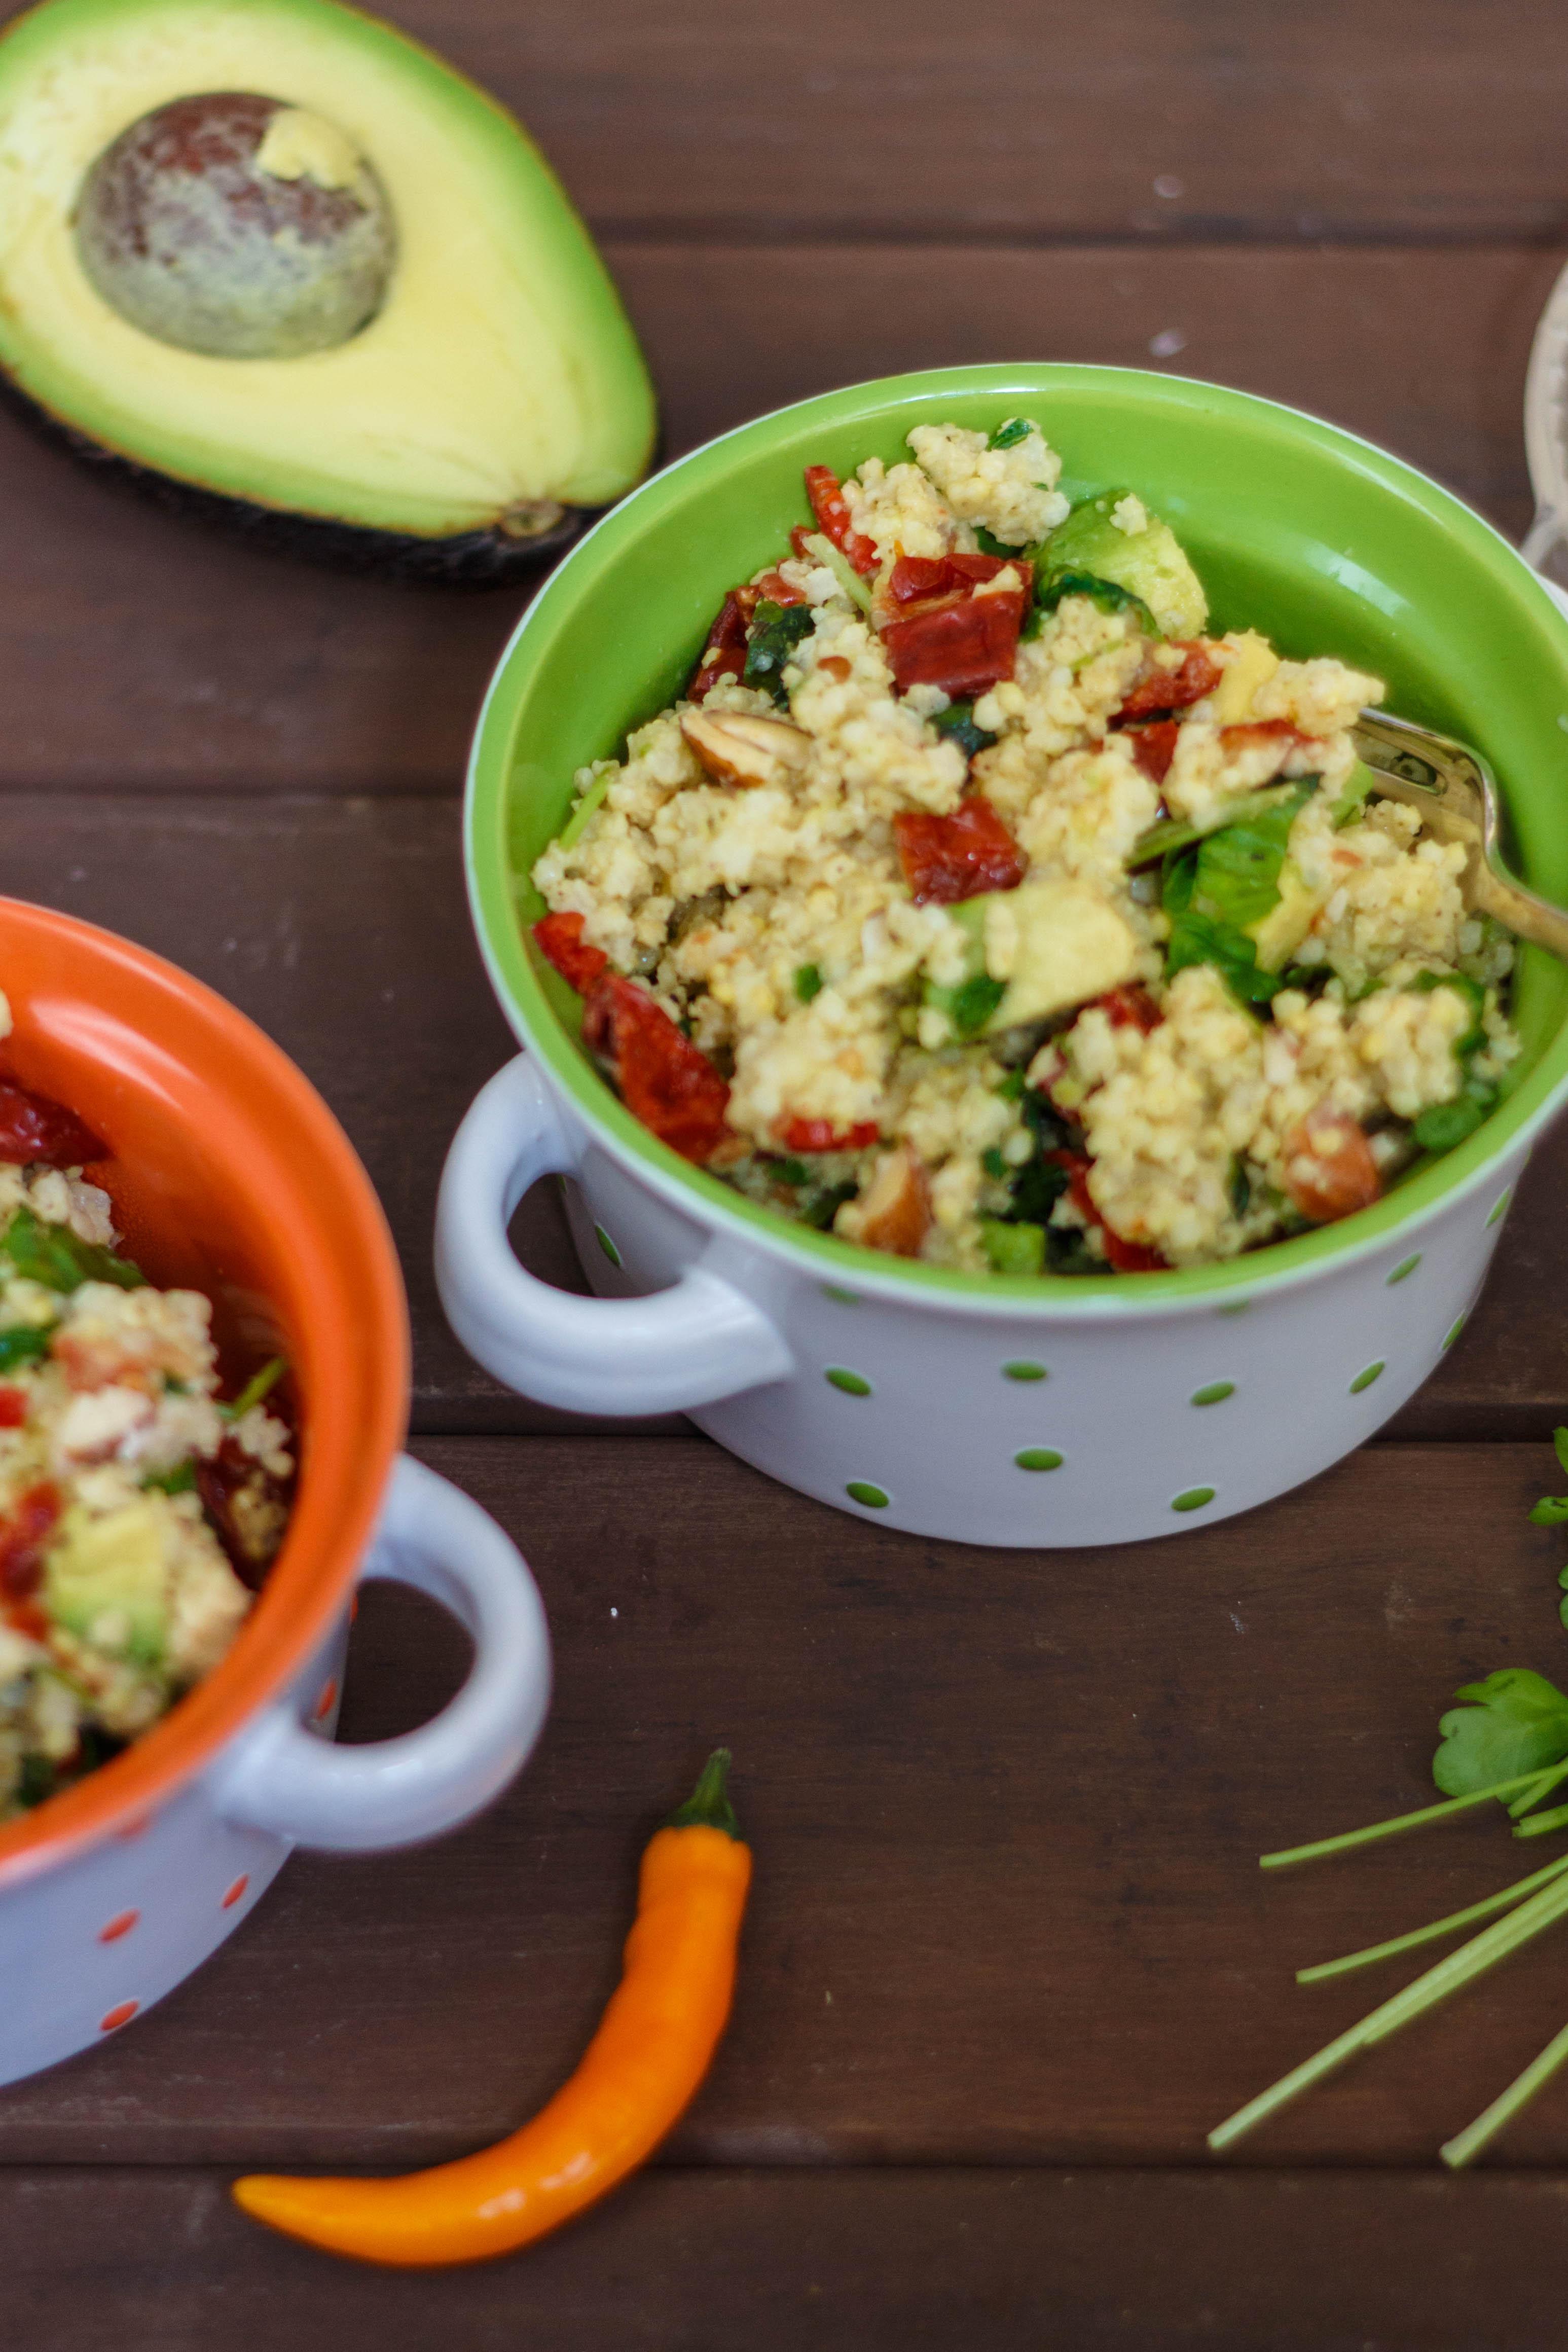 Hirse salat mediterran